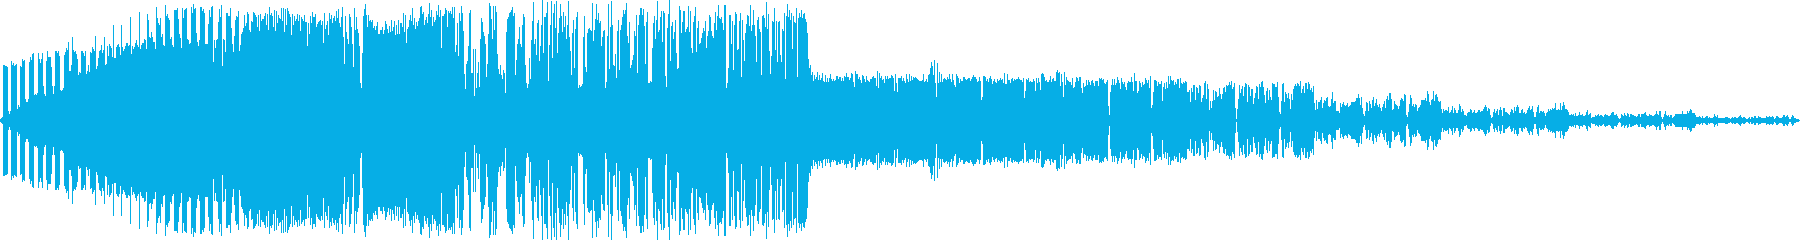 AMGアナログFX 29の再生済みの波形